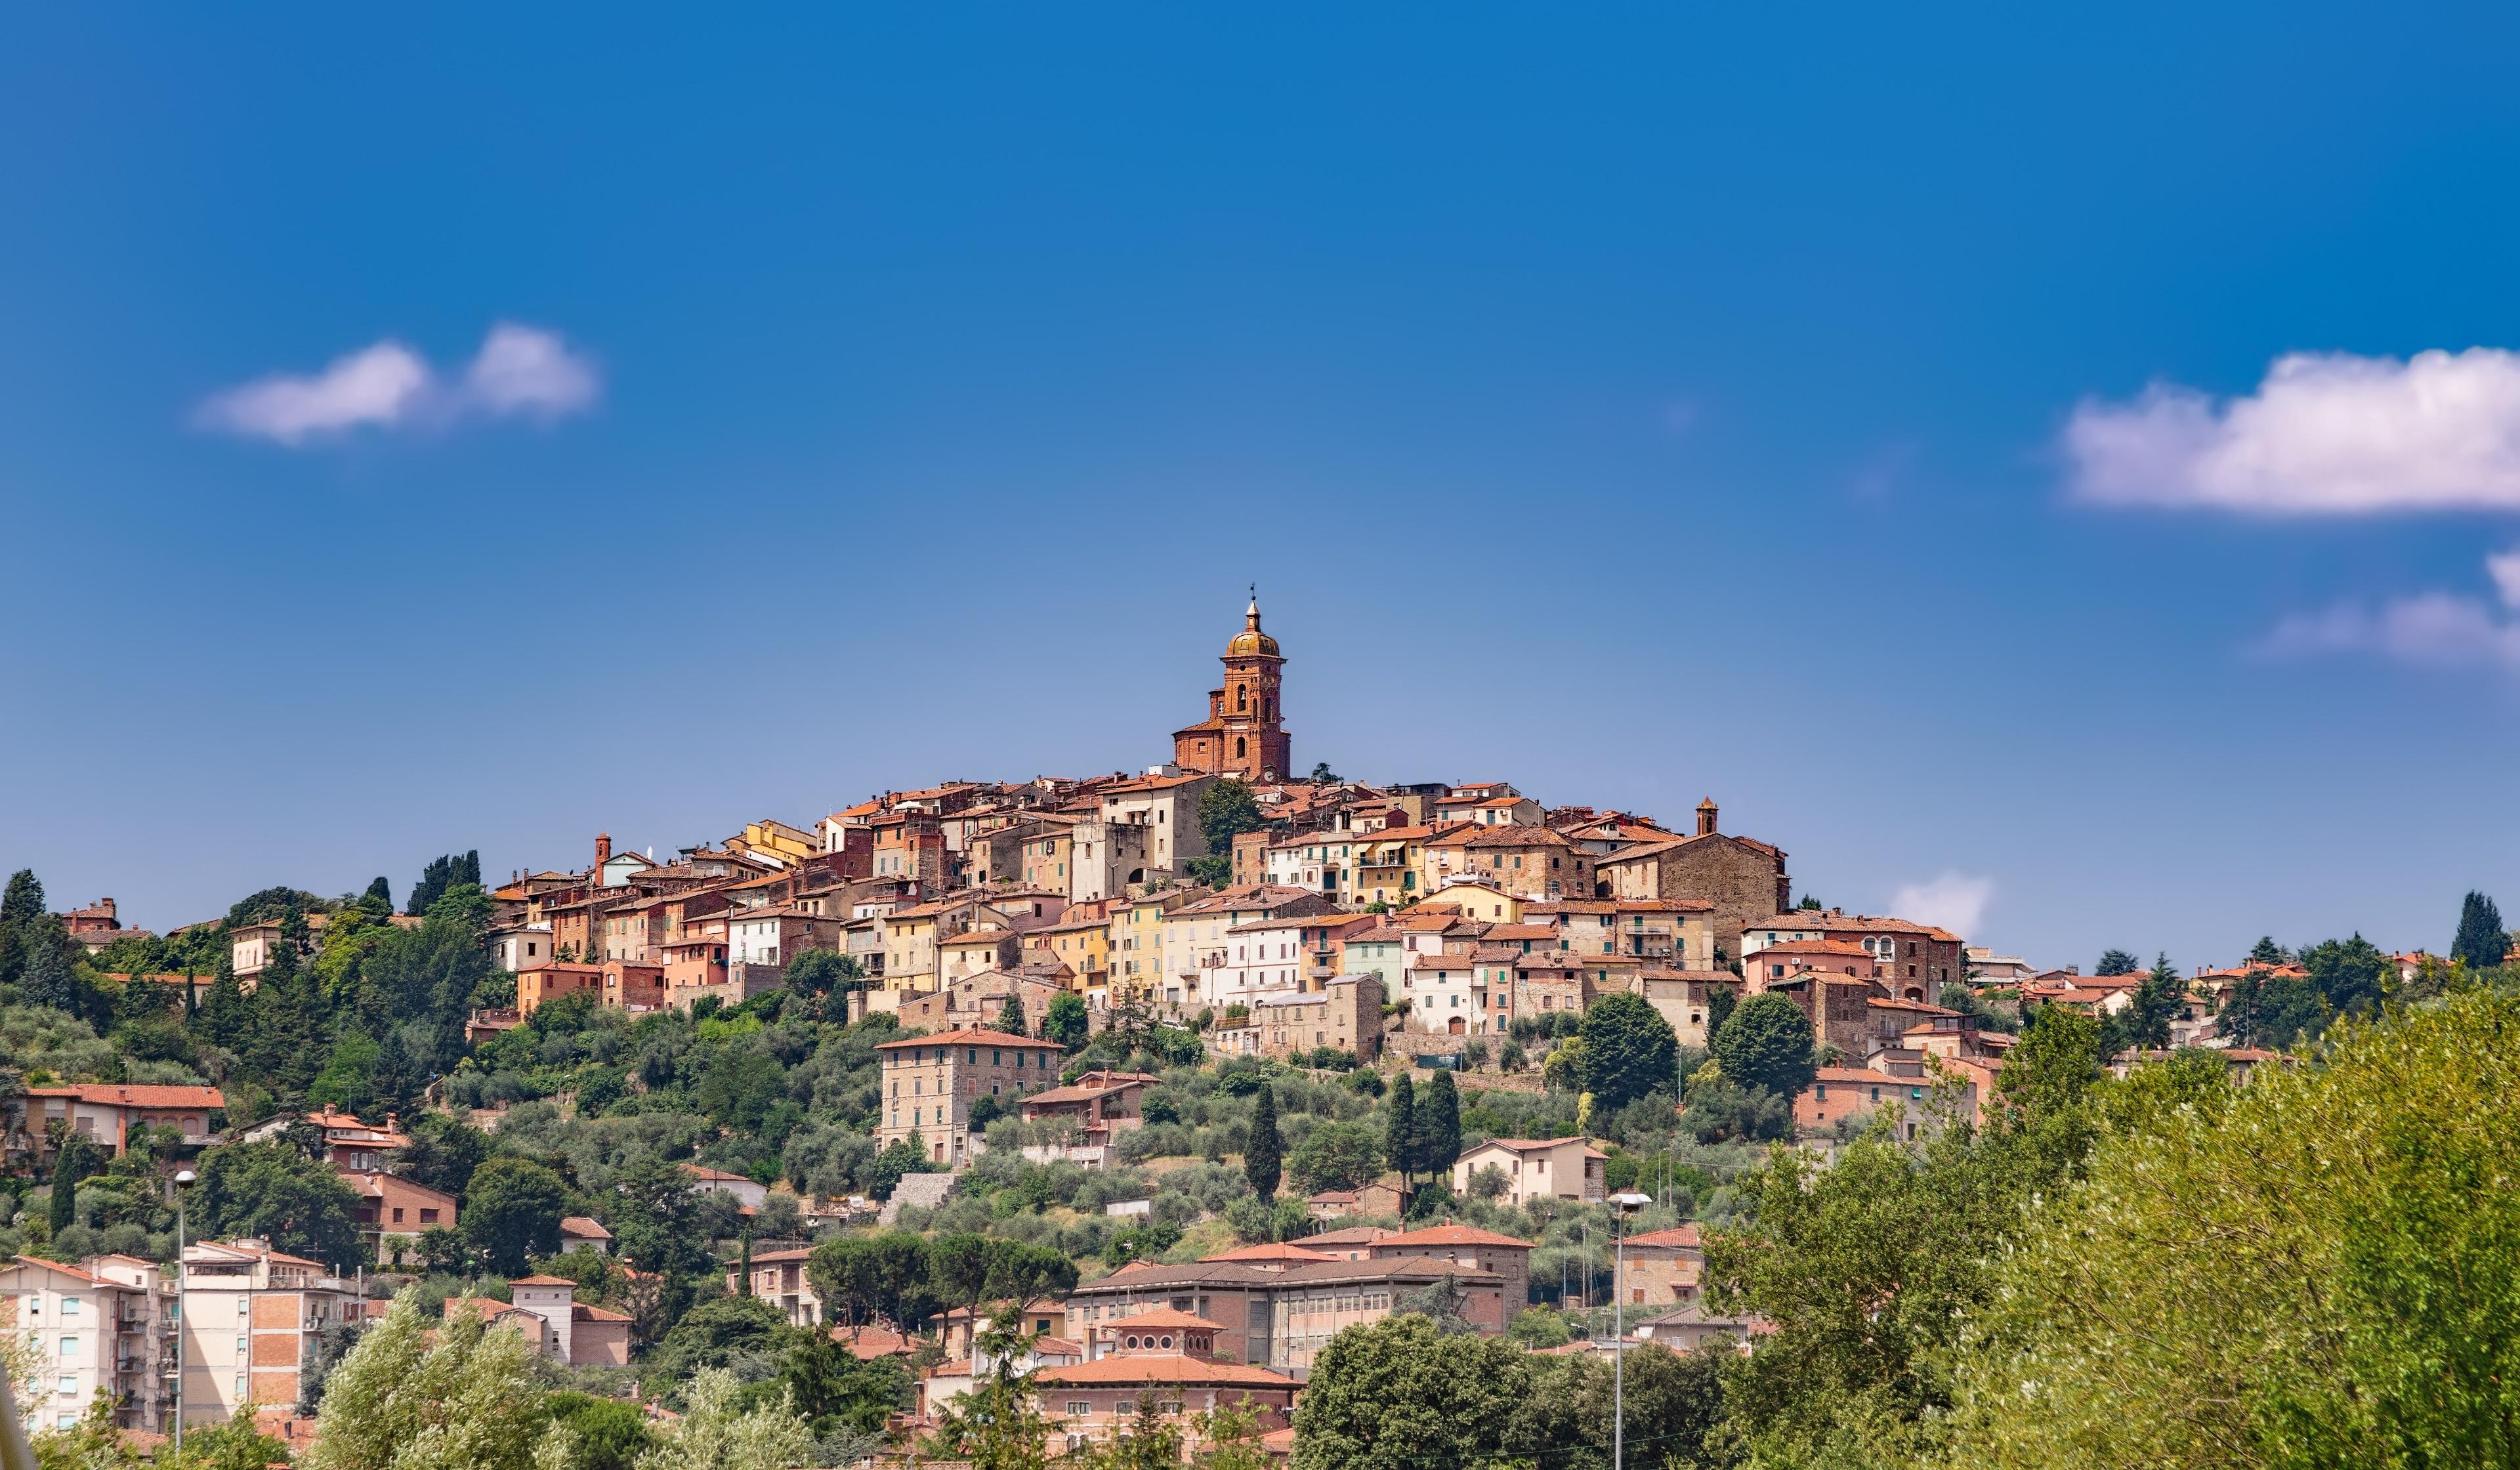 Sinalunga, Tuscany, Italy